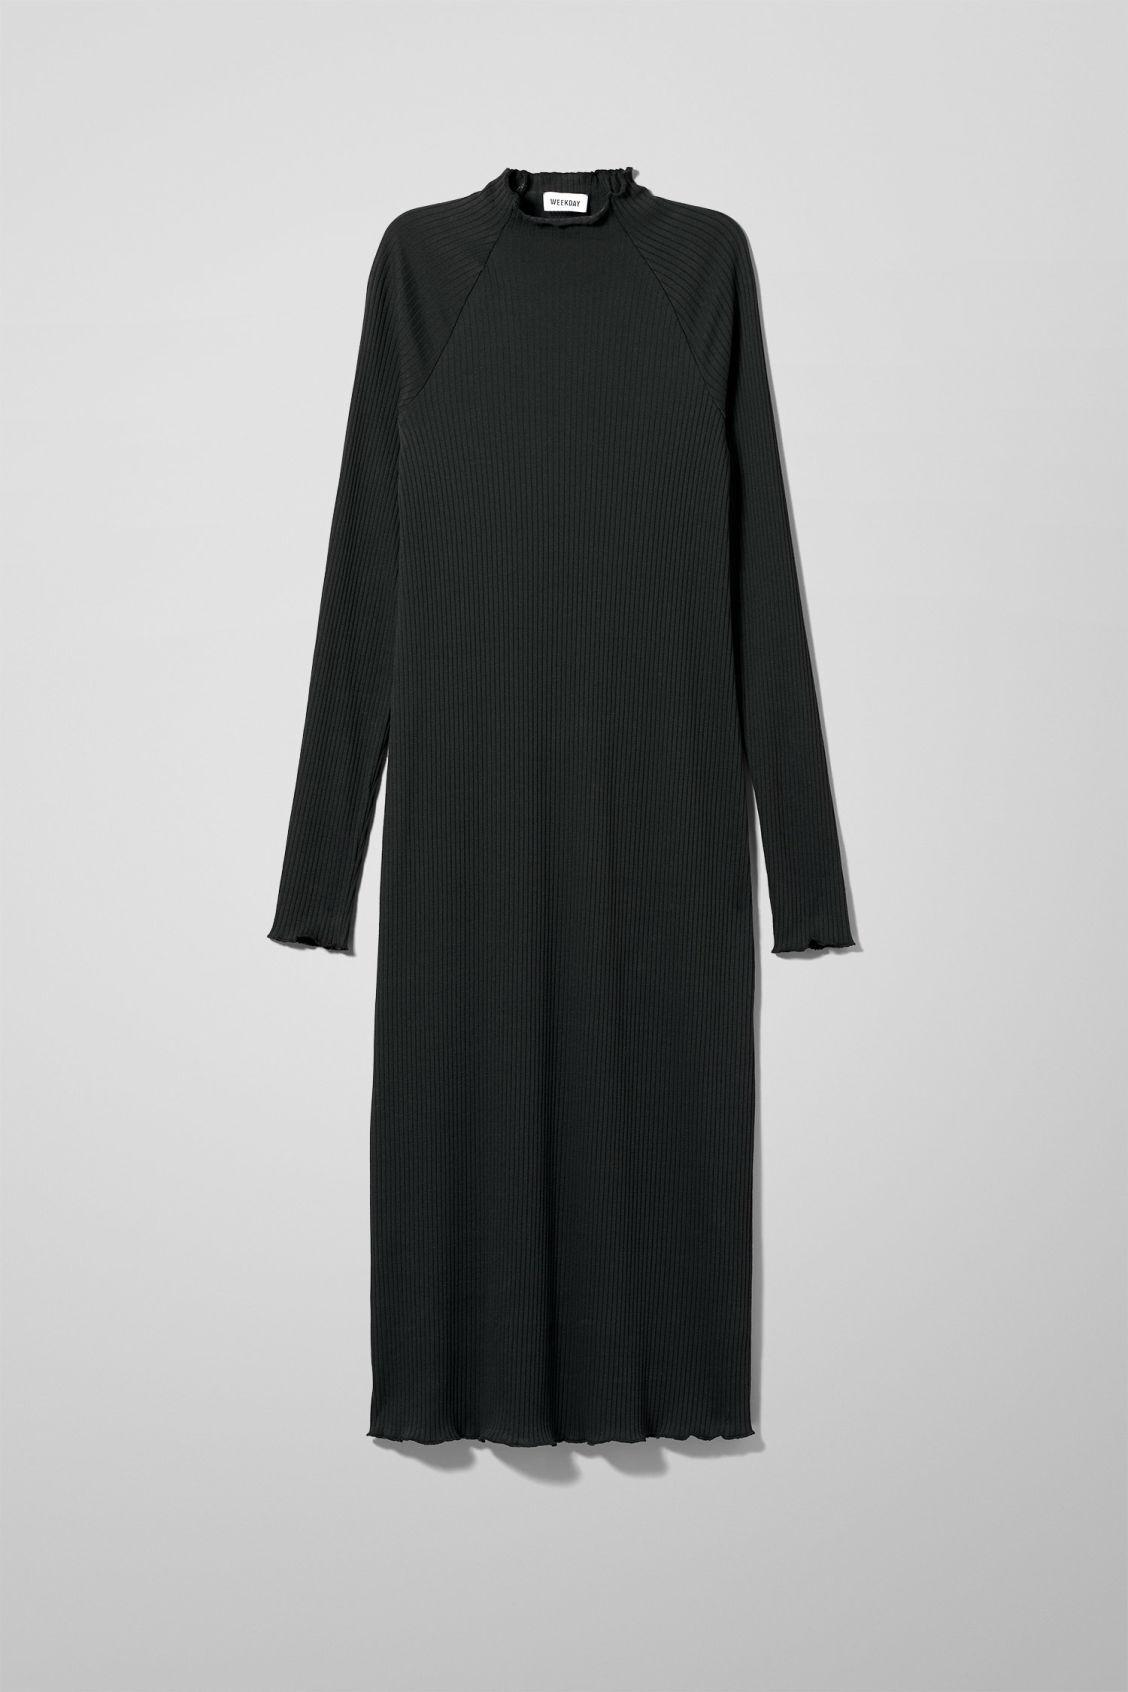 Image of Loretta Dress - Black-M